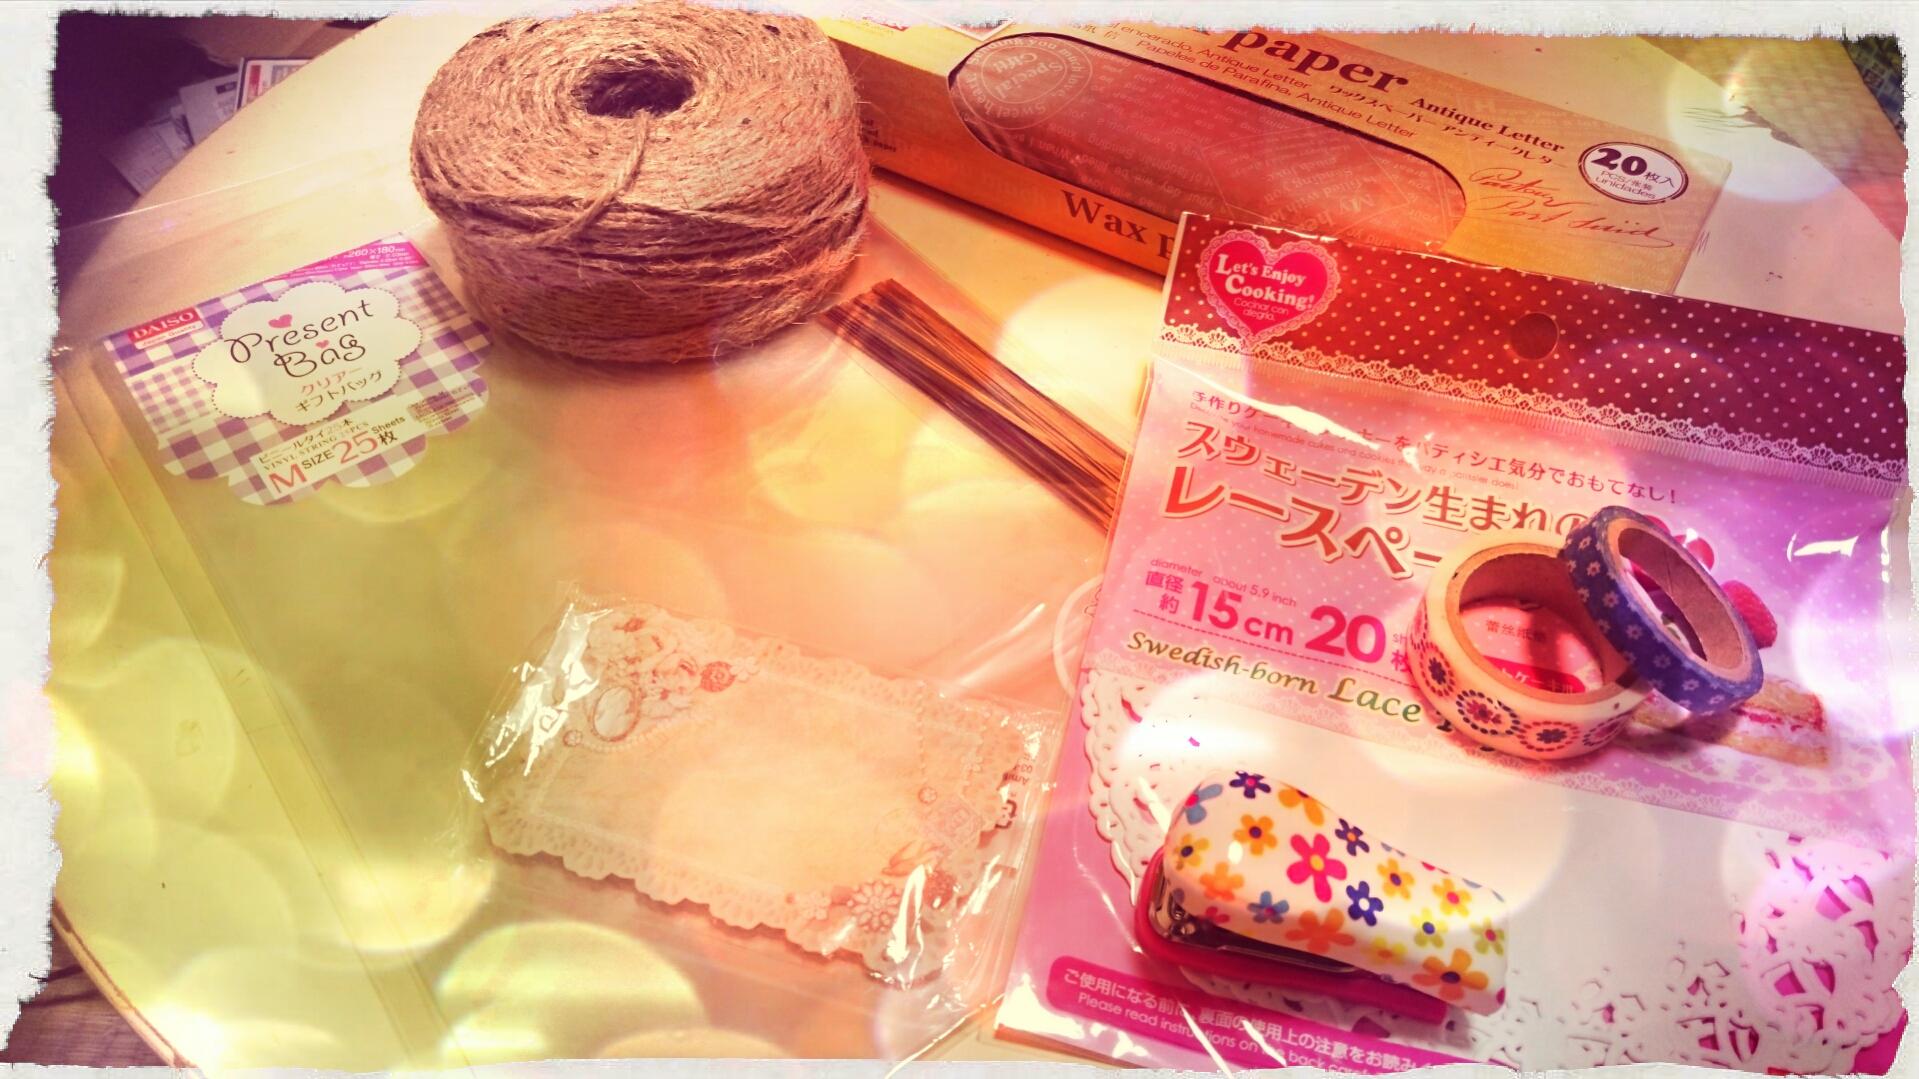 DSC_0586_Janine_Rainbow_Sju.jpg